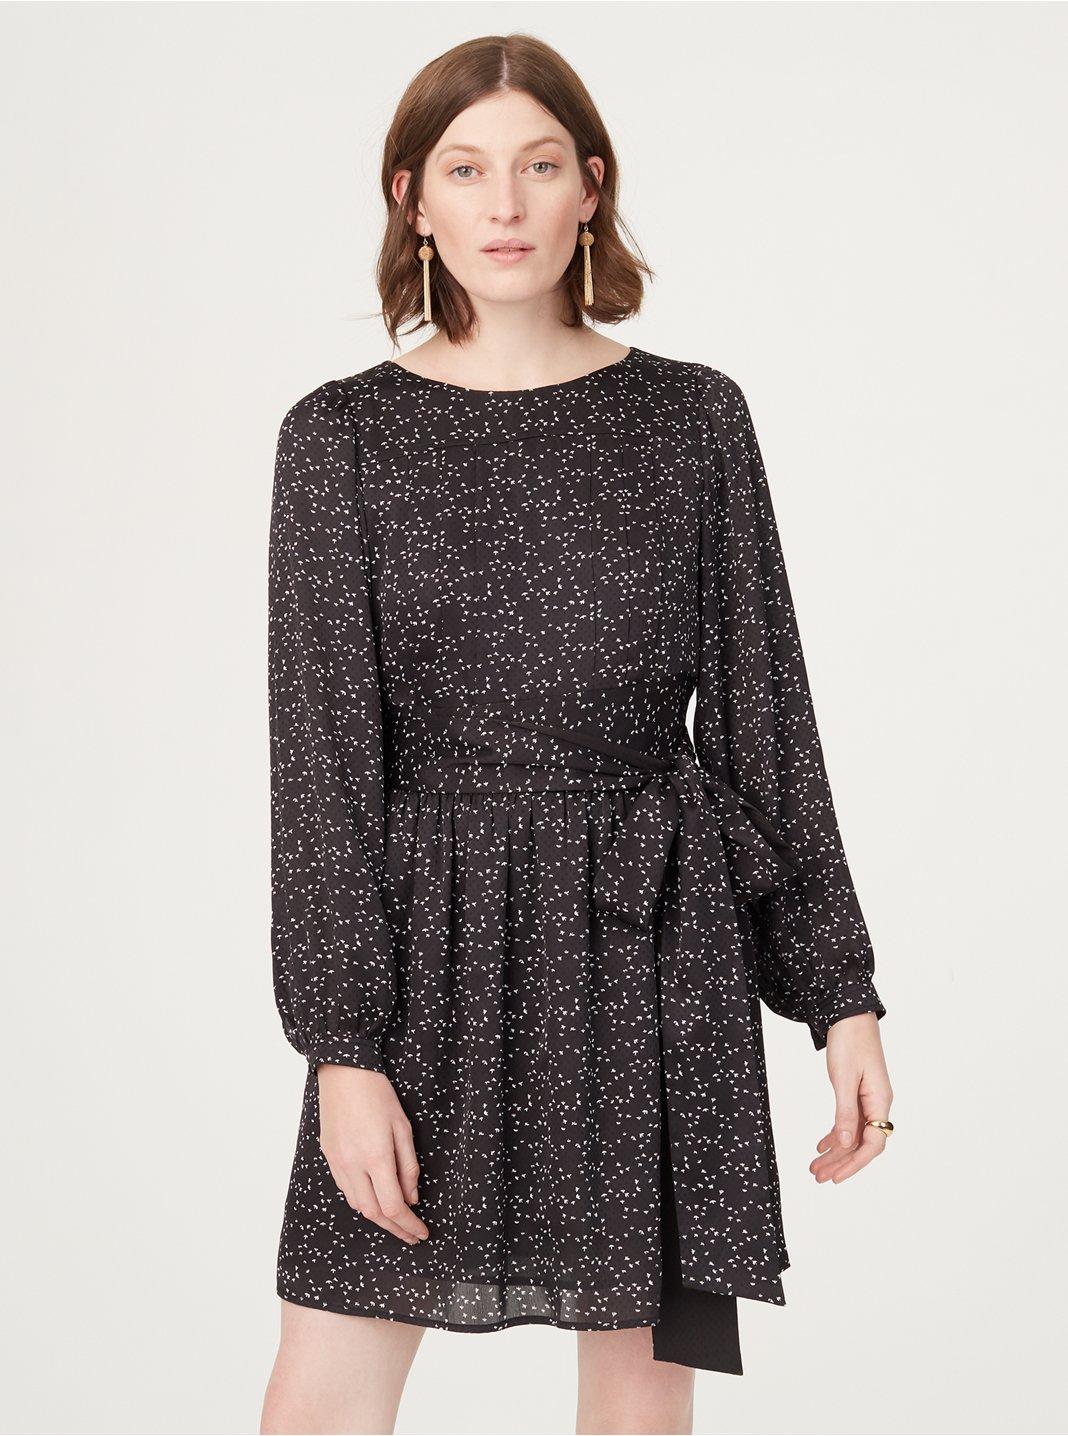 Turple Dress